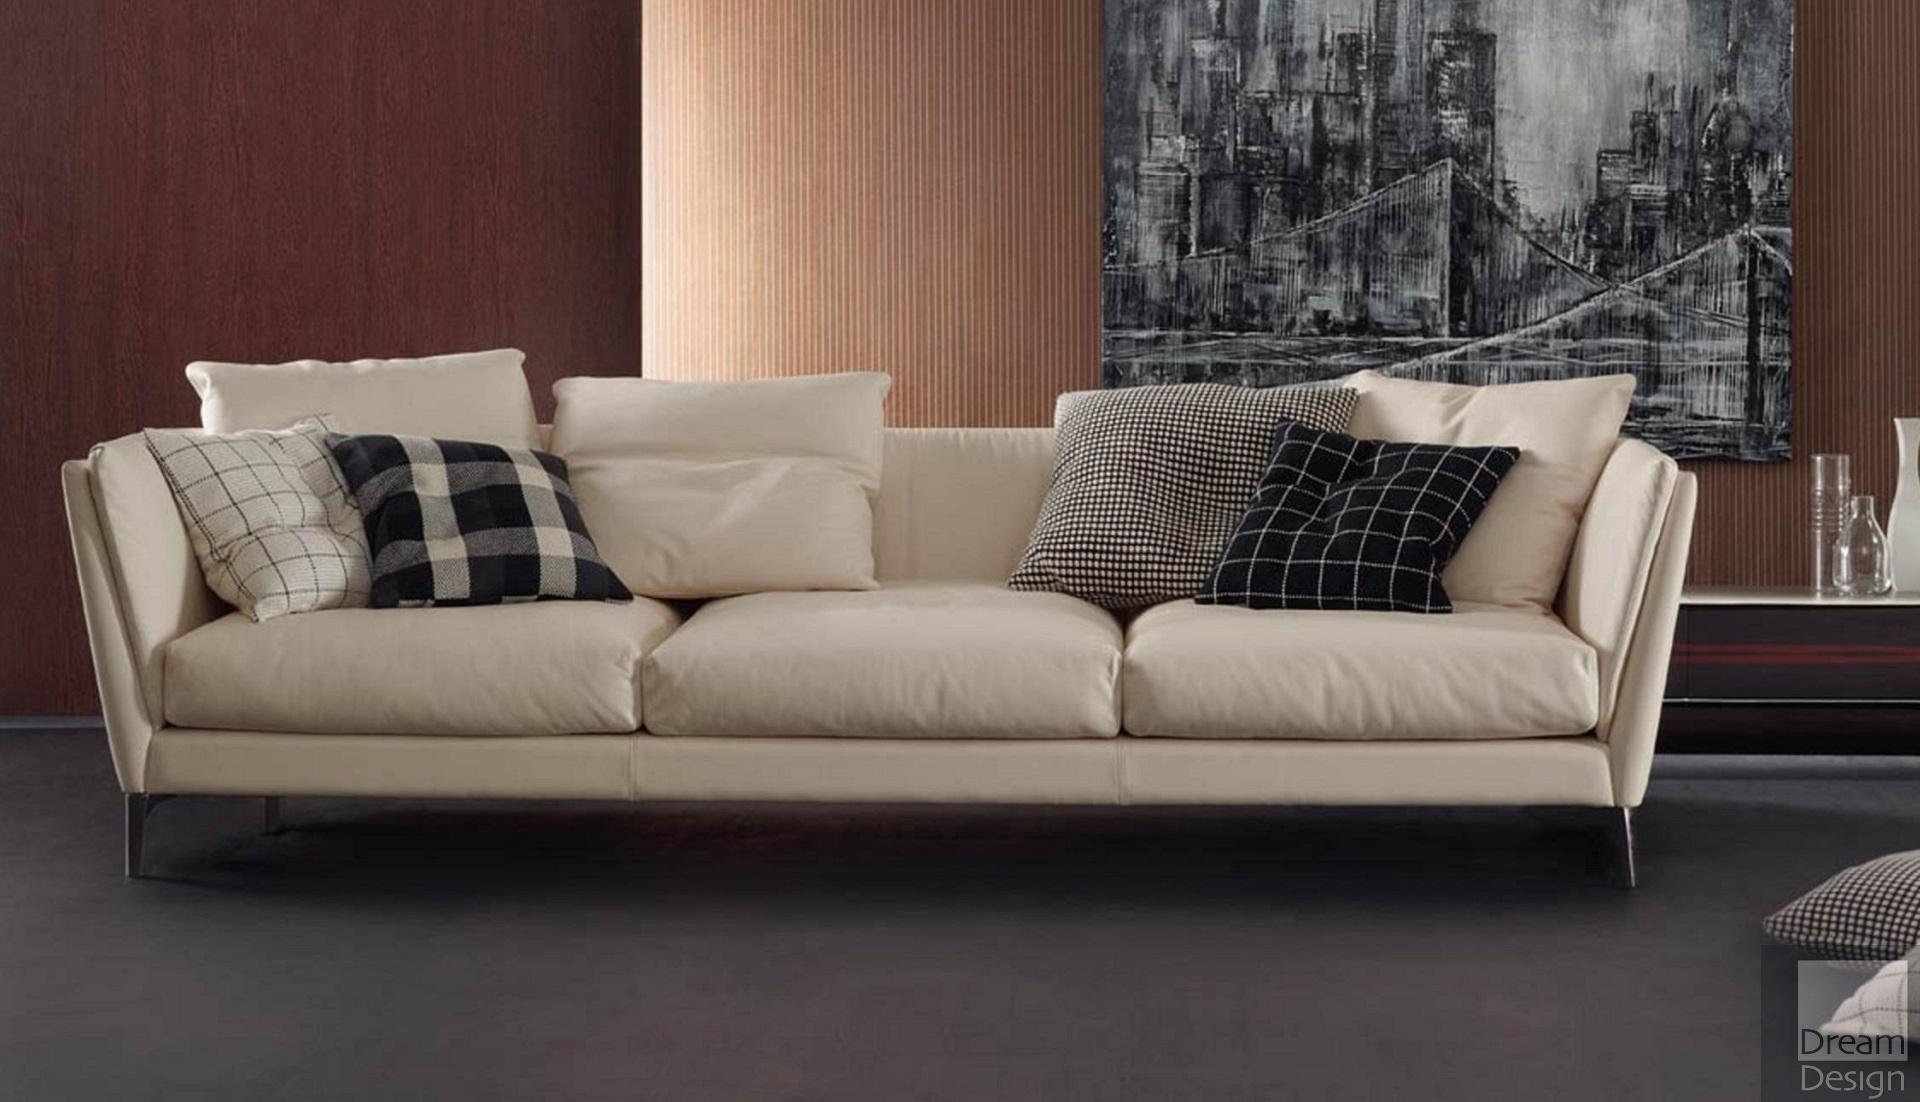 Poltrona Sofa.Poltrona Frau Bretagne Sofa Dream Design Interiors Ltd